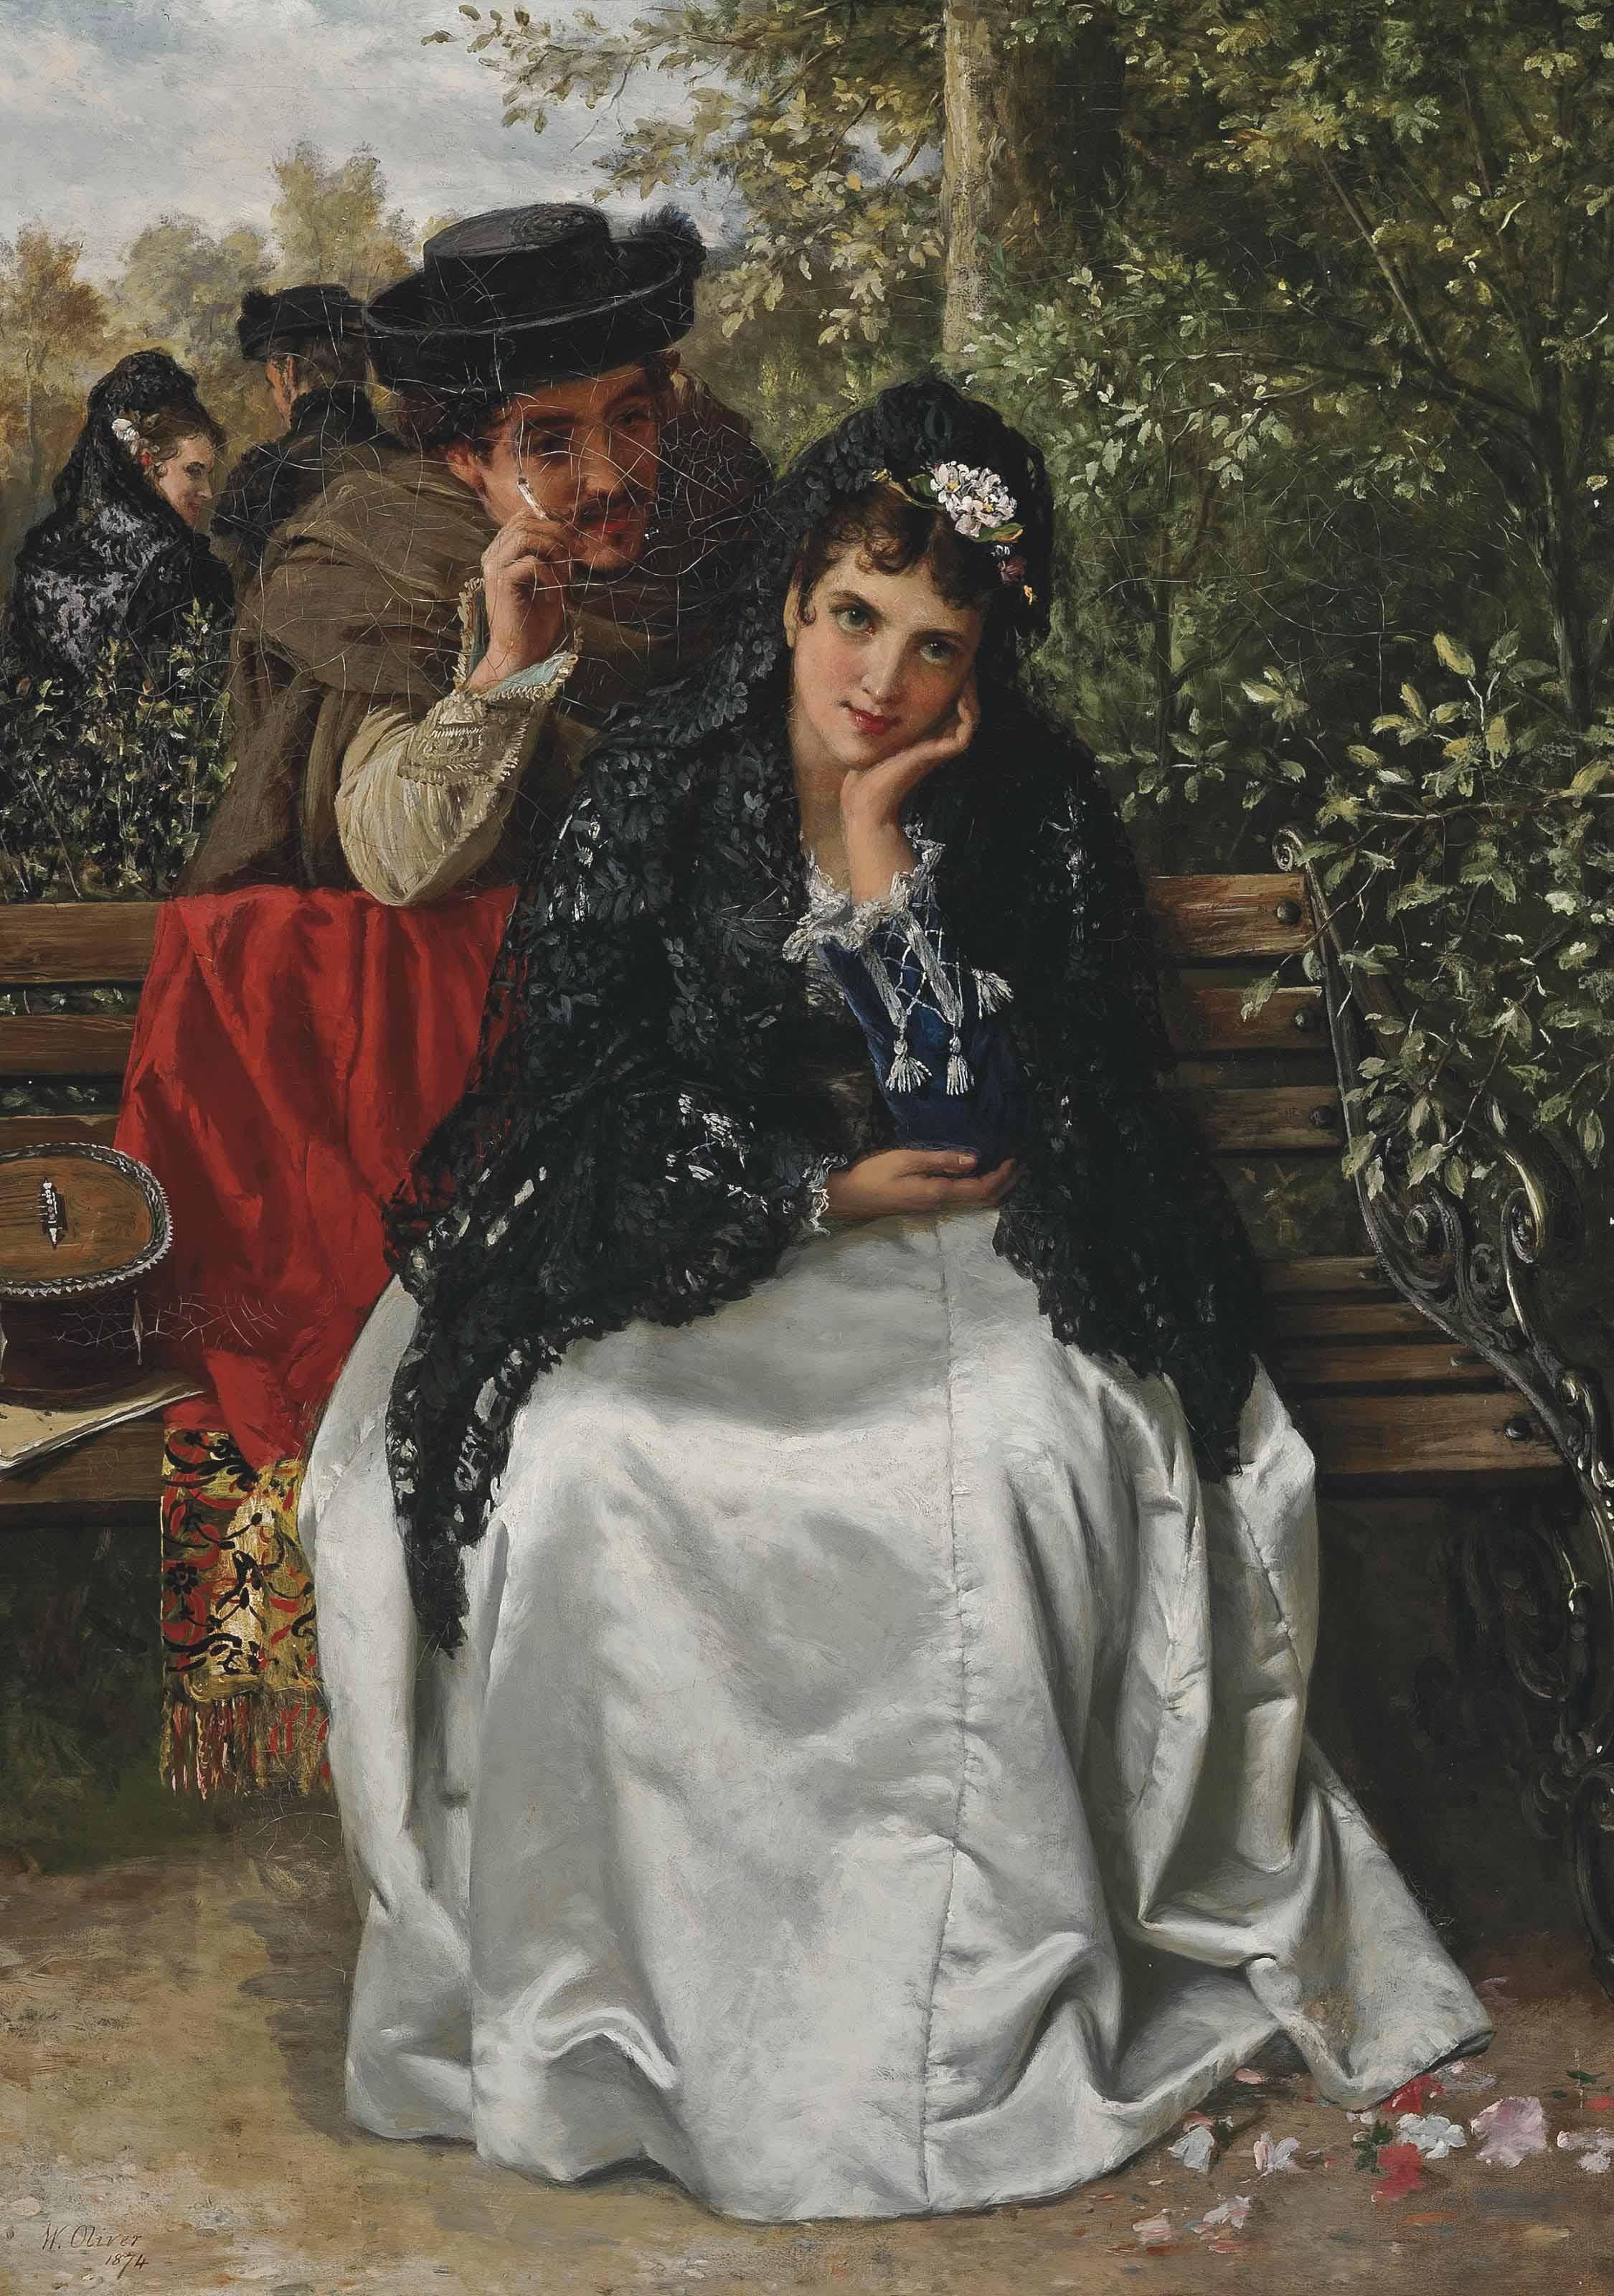 Spanish lovers